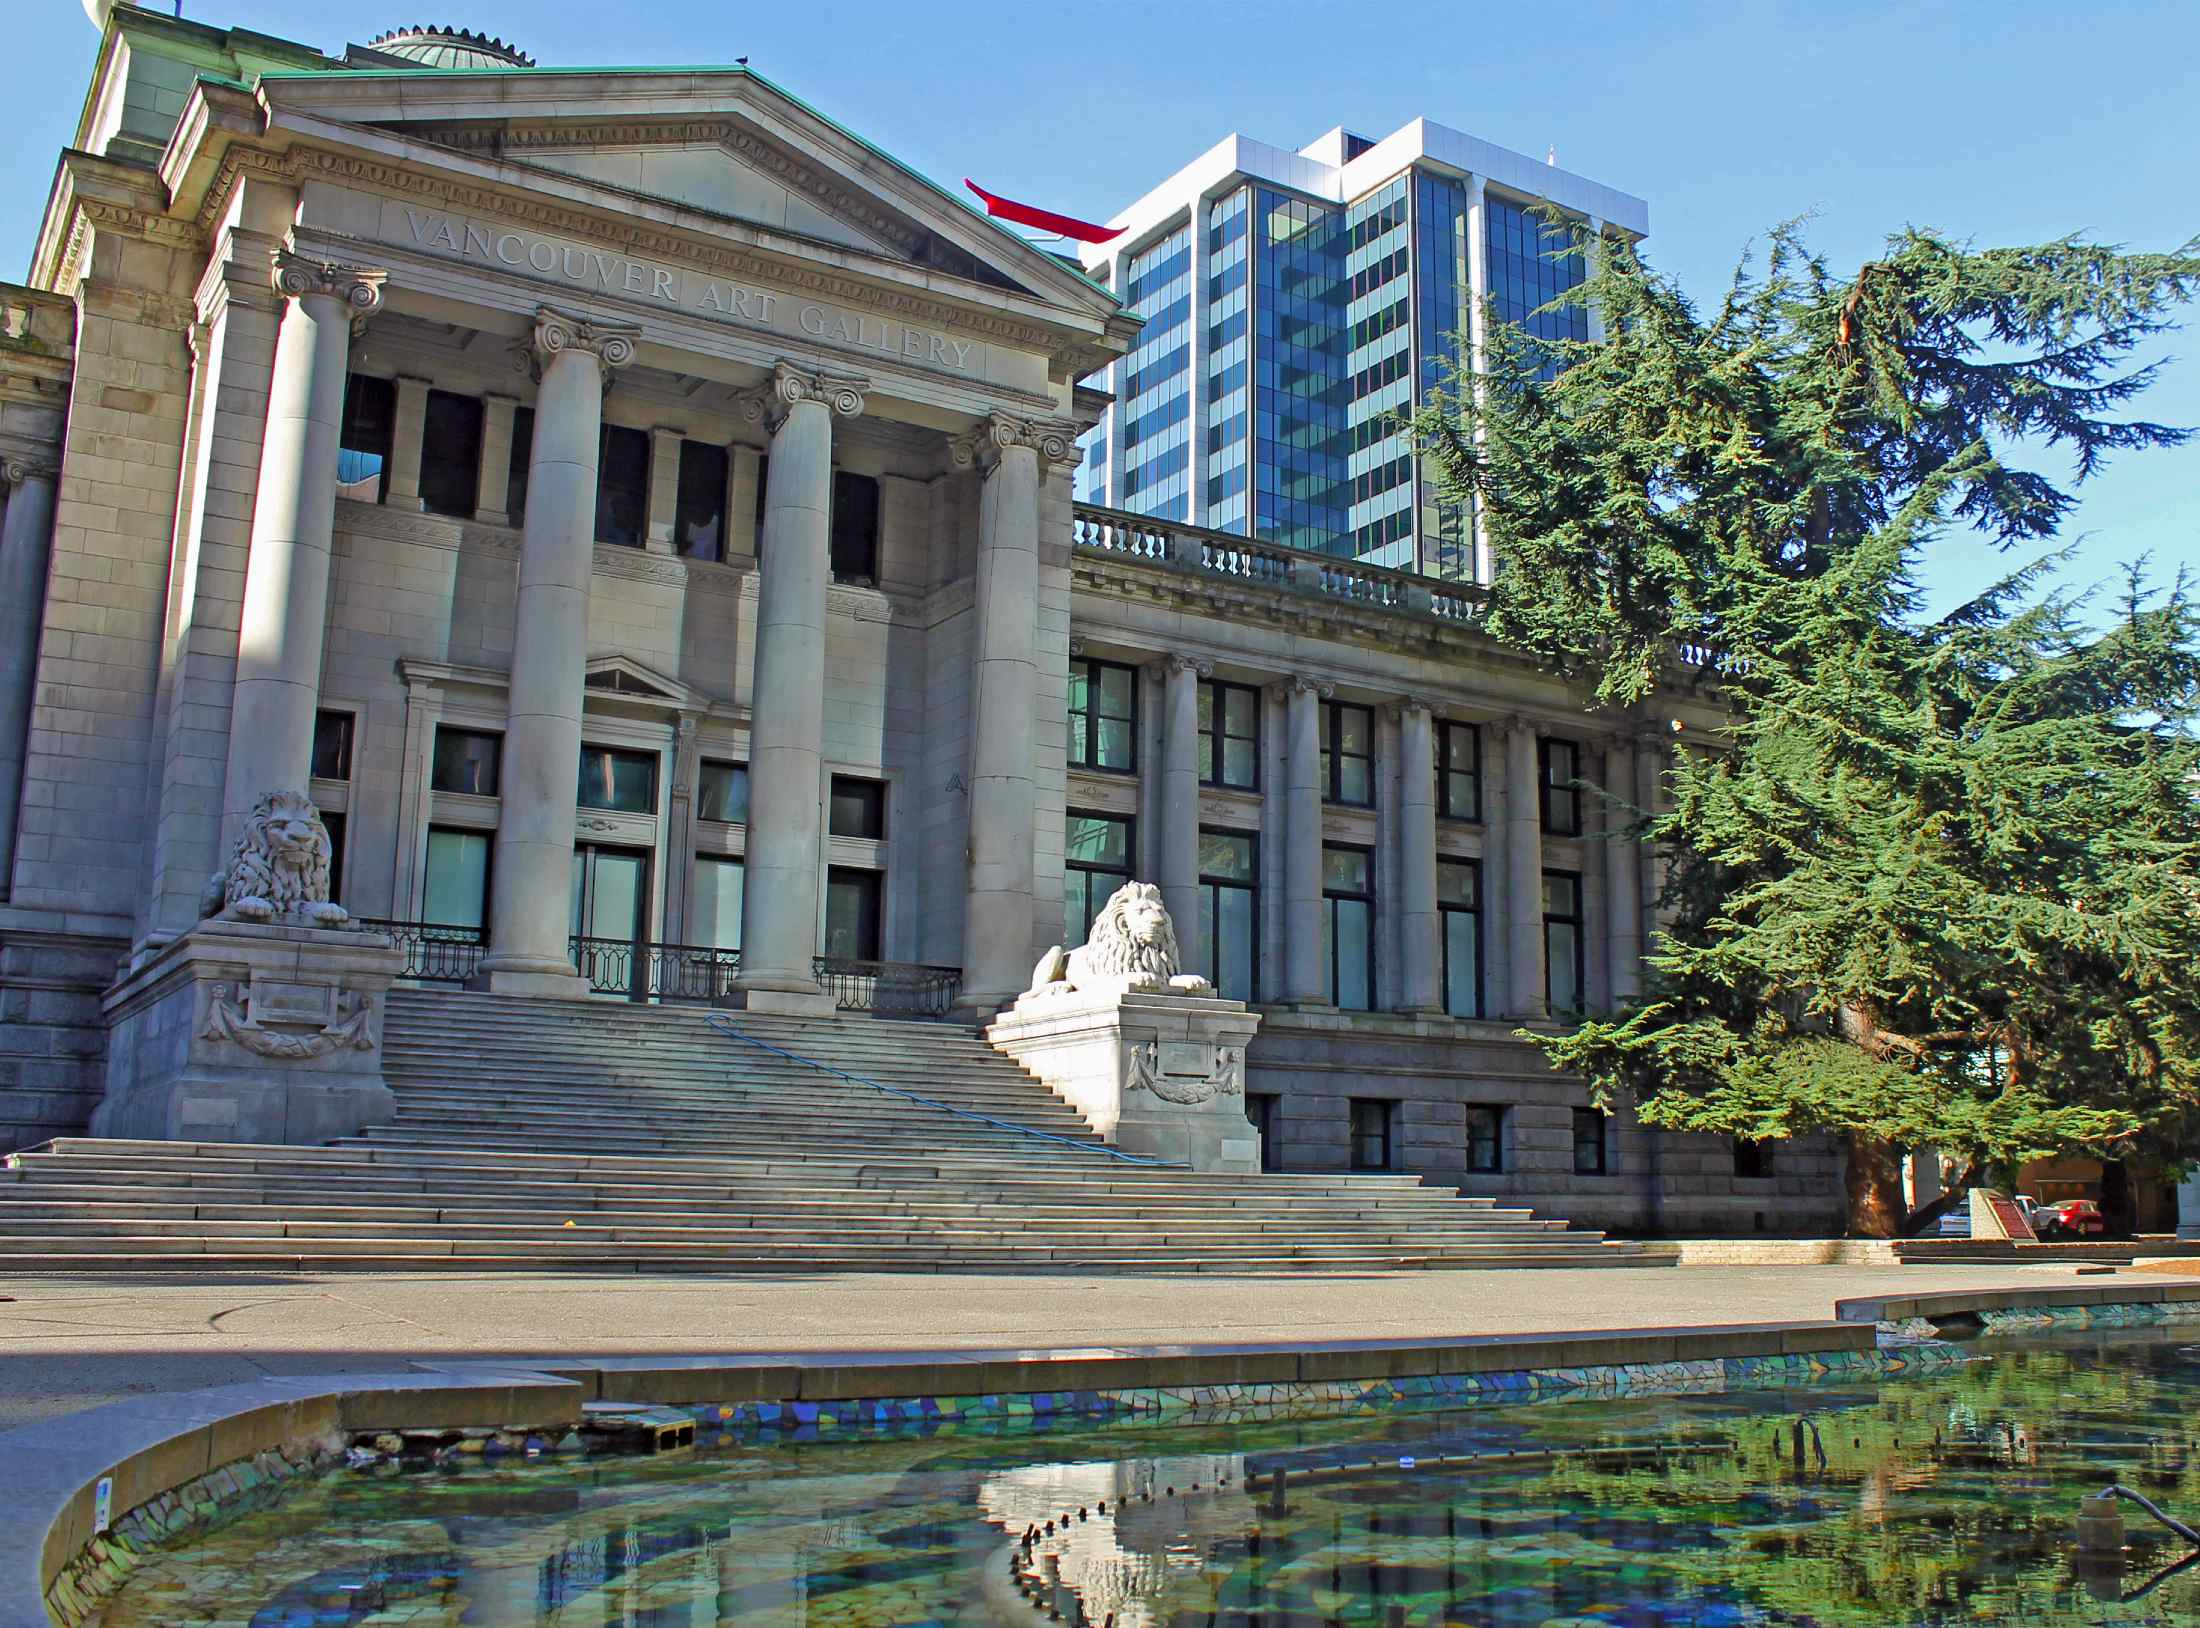 Vancouver Art Gallery - Focal Journey